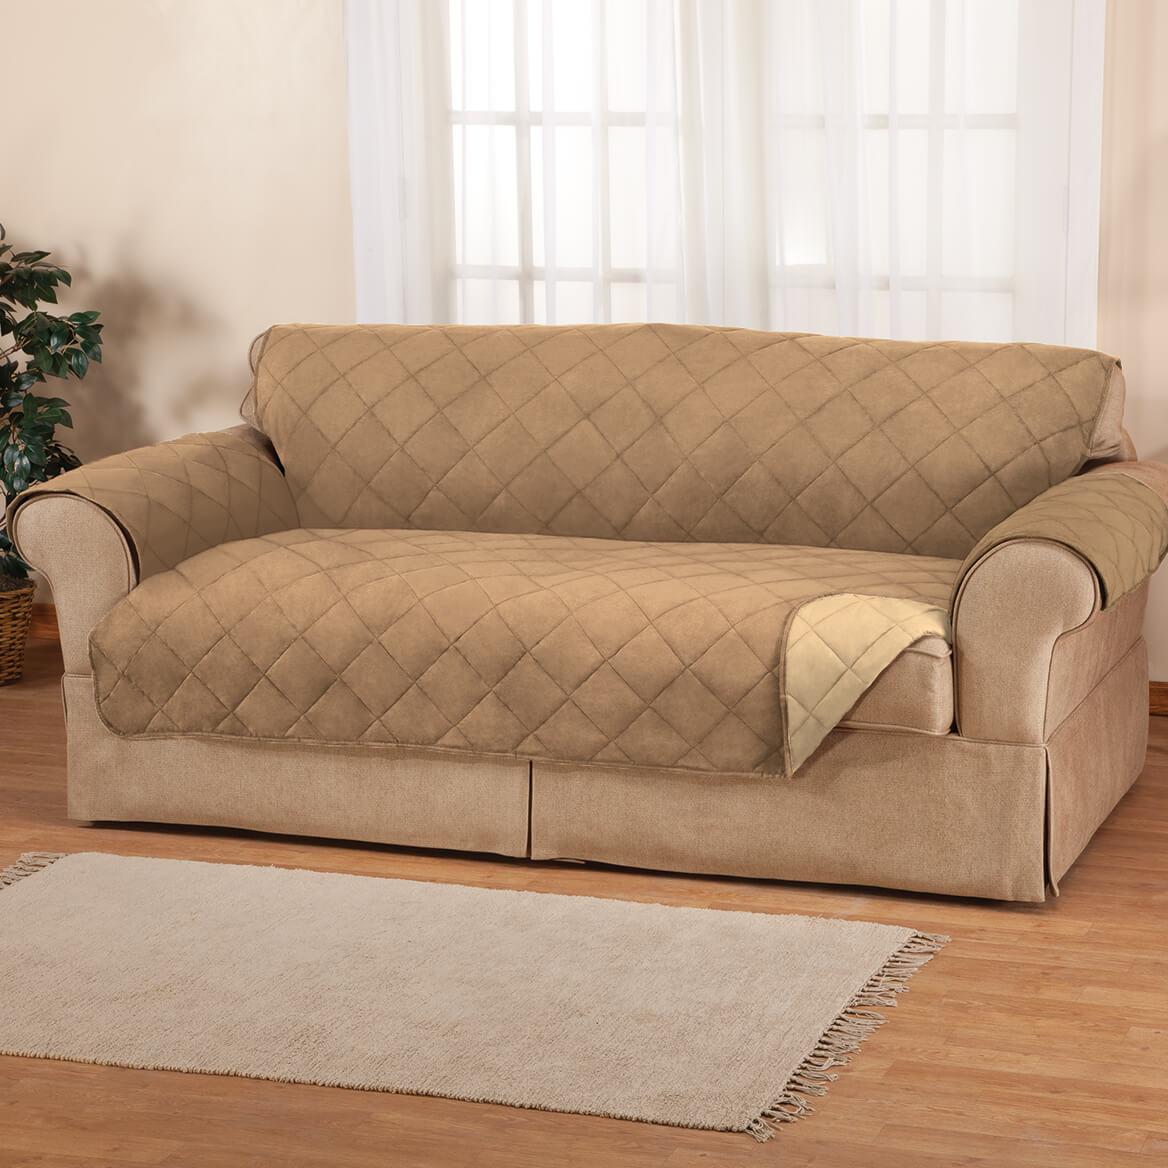 Naomi Suede-Microfiber XL Sofa Cover By OakRidge